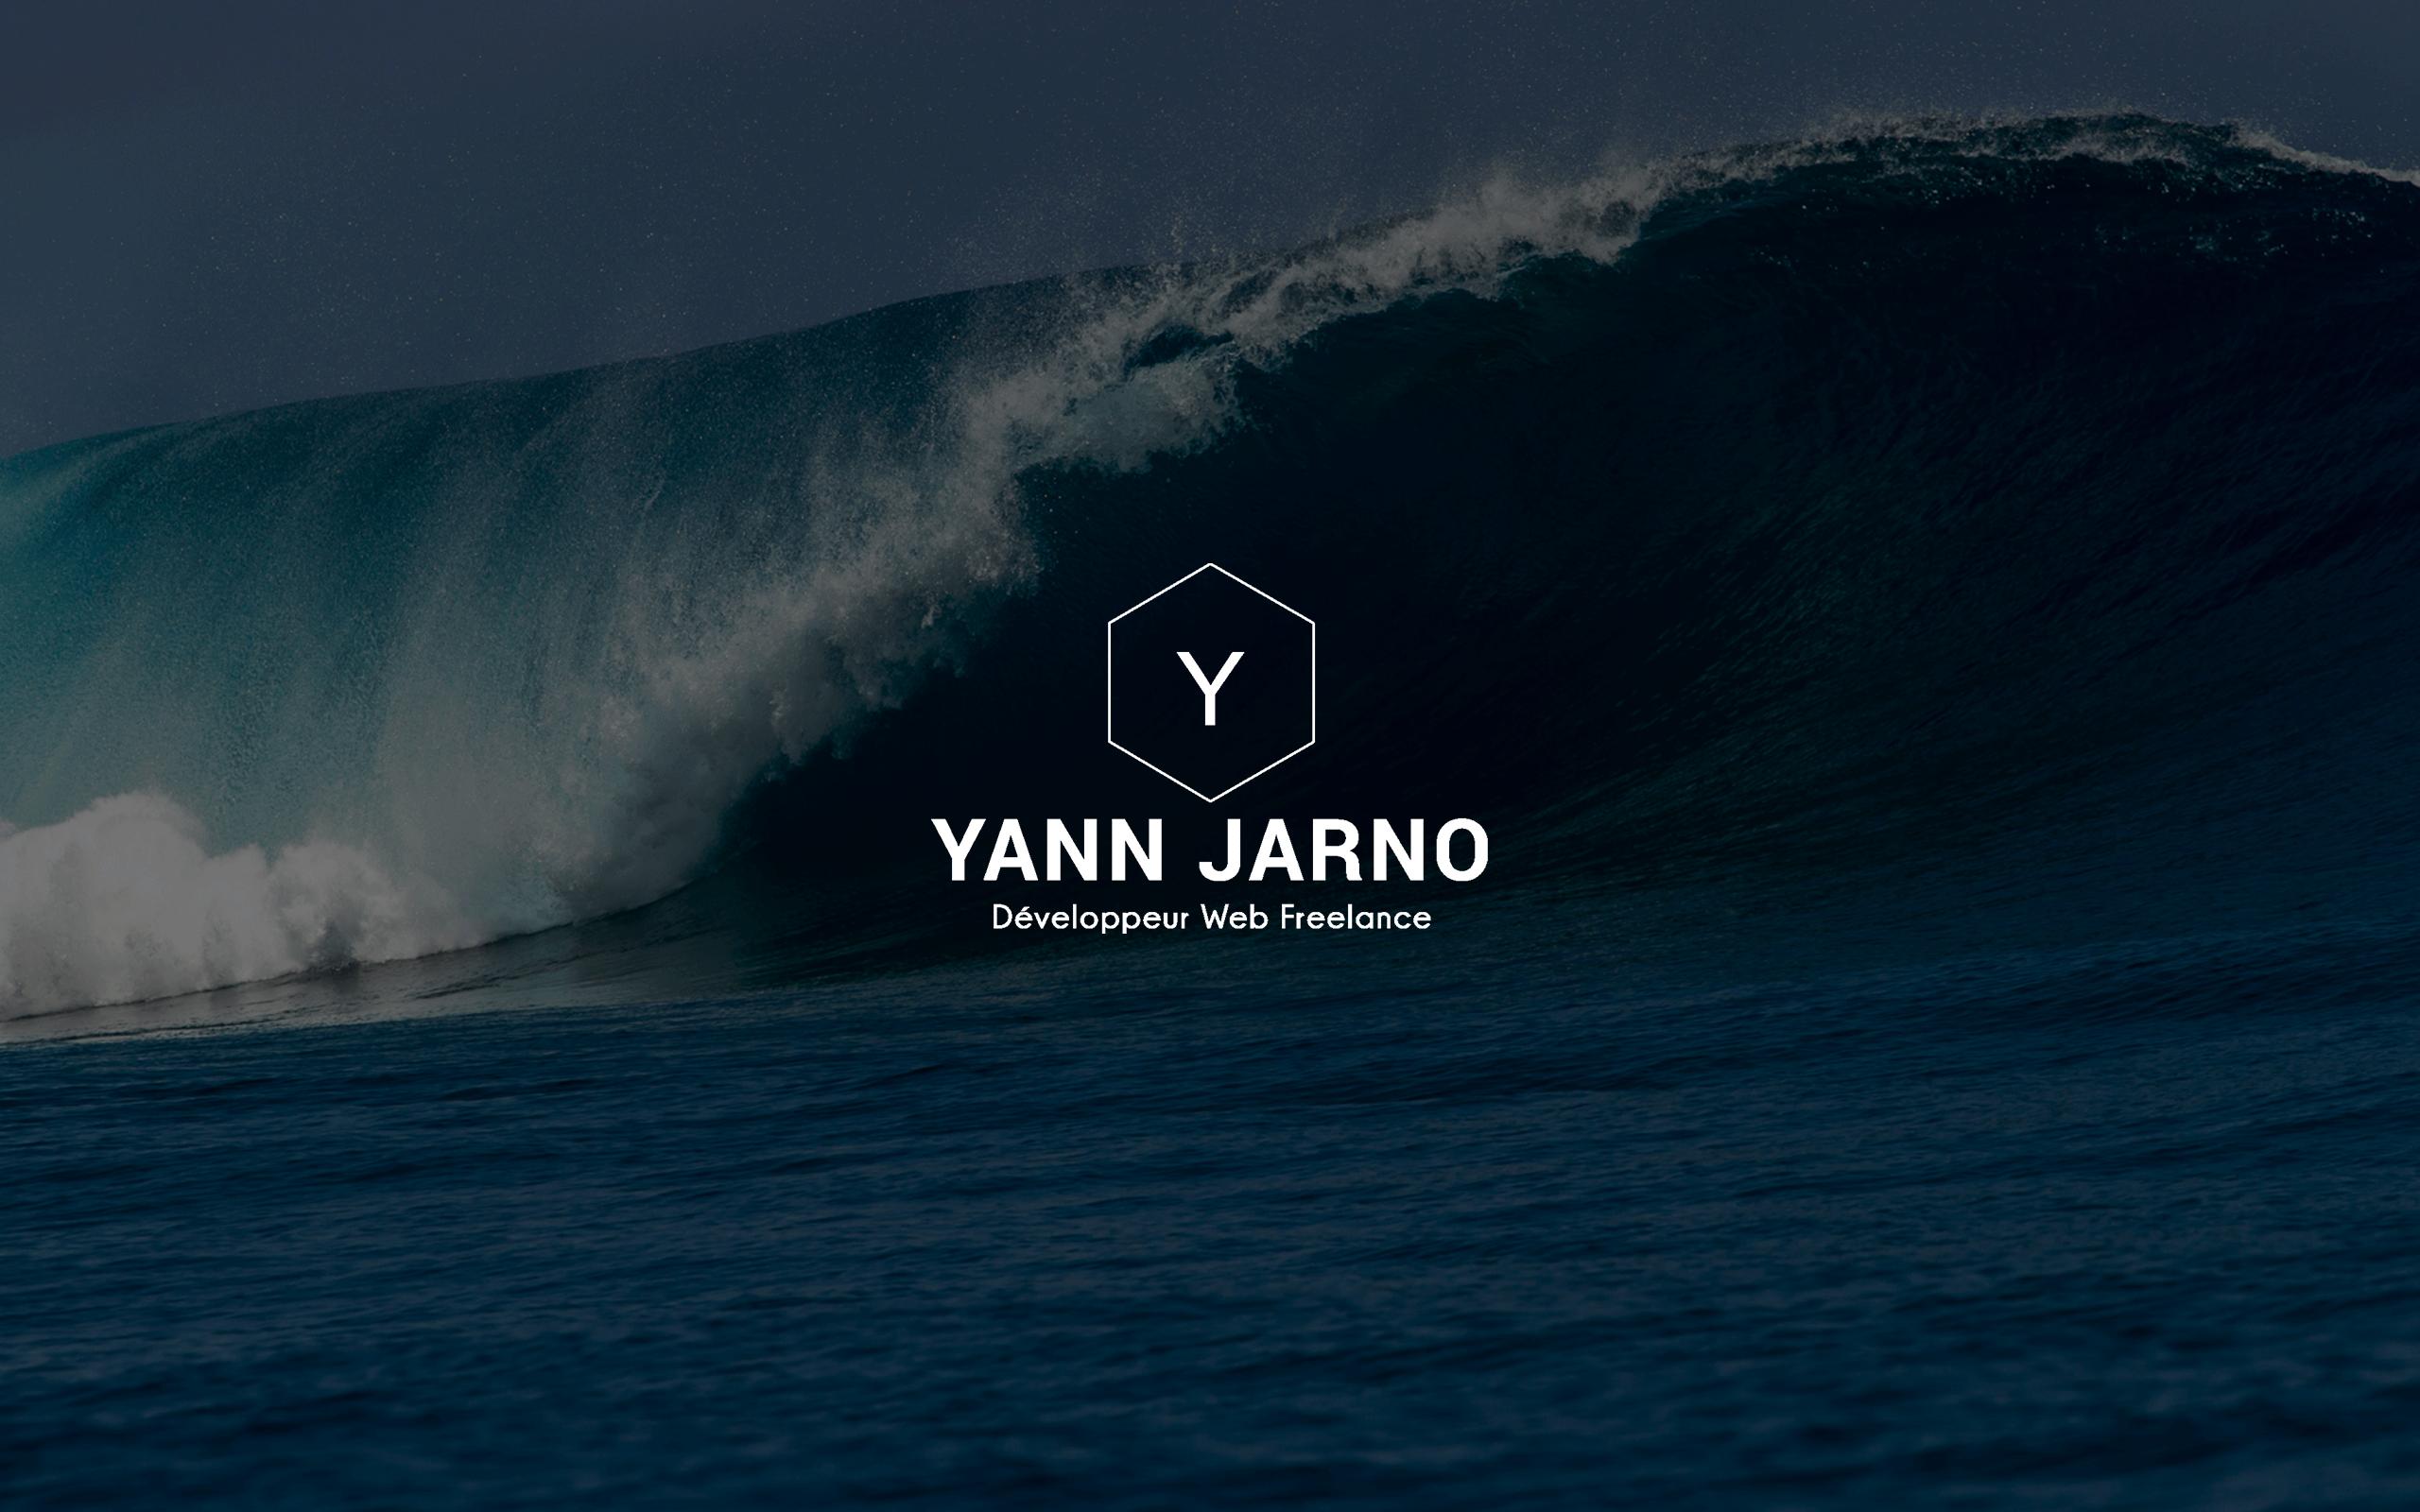 yann-jarno-background-1